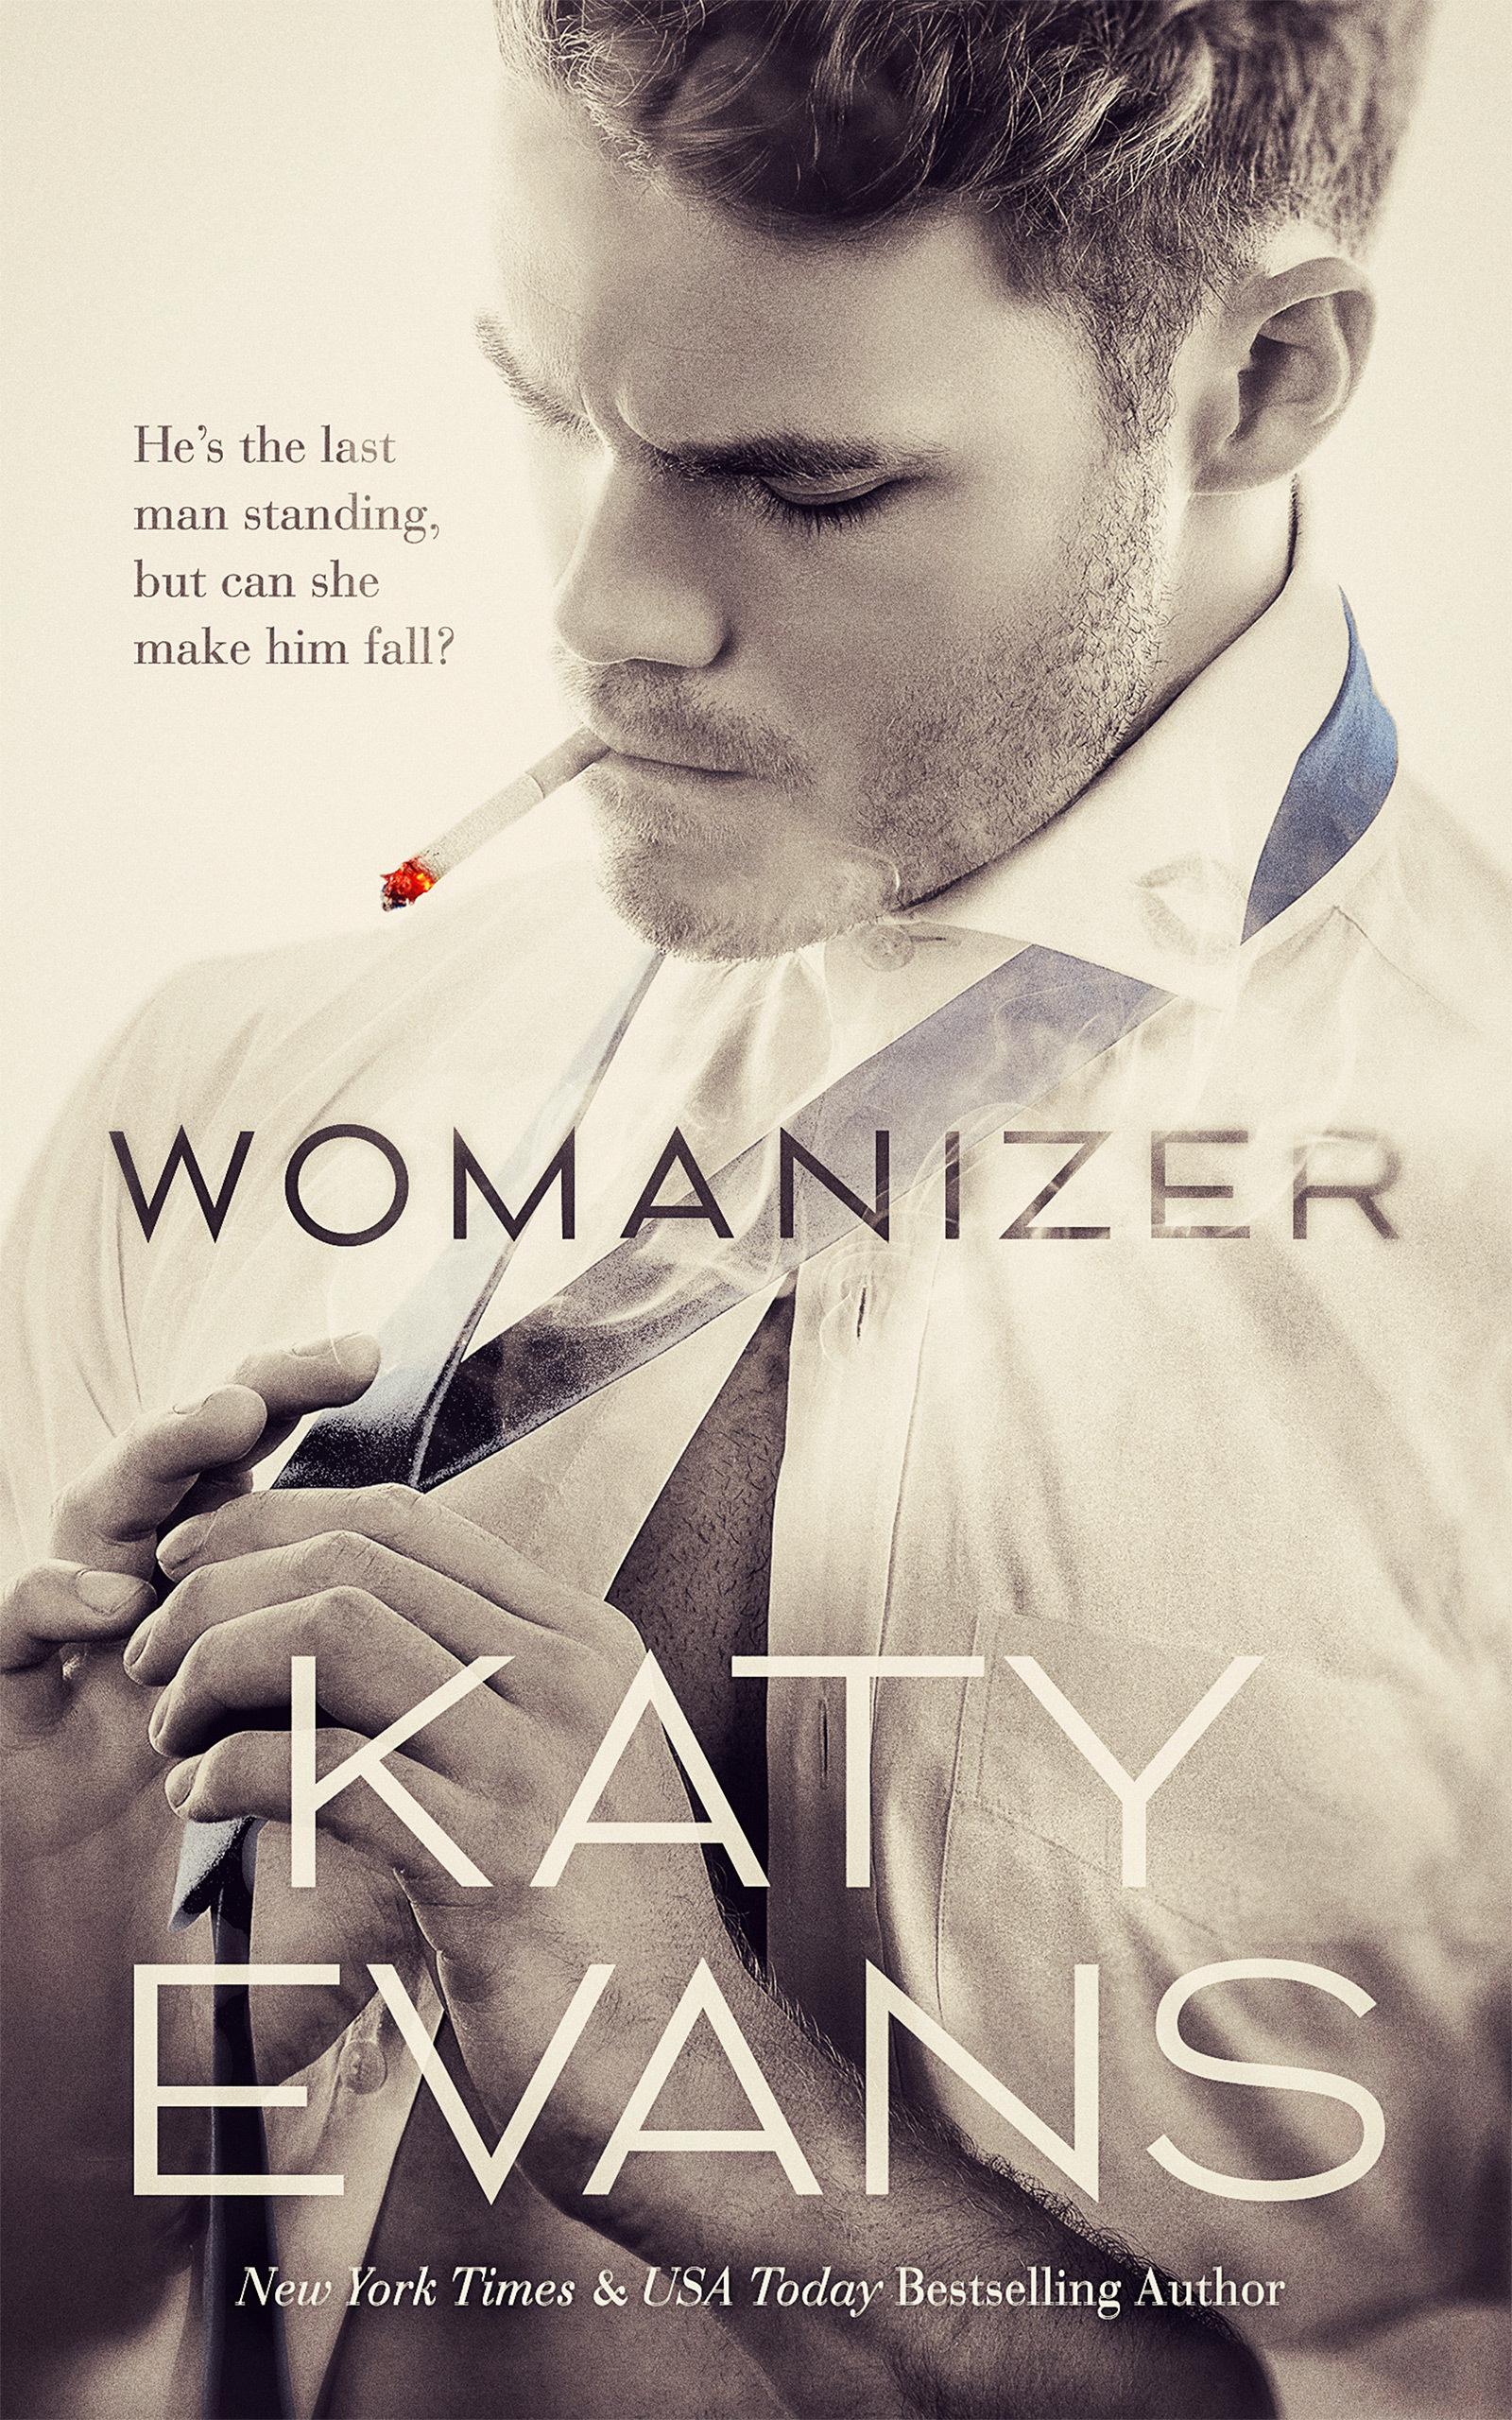 Katy Evans - Manwhore 4 - Womanizer